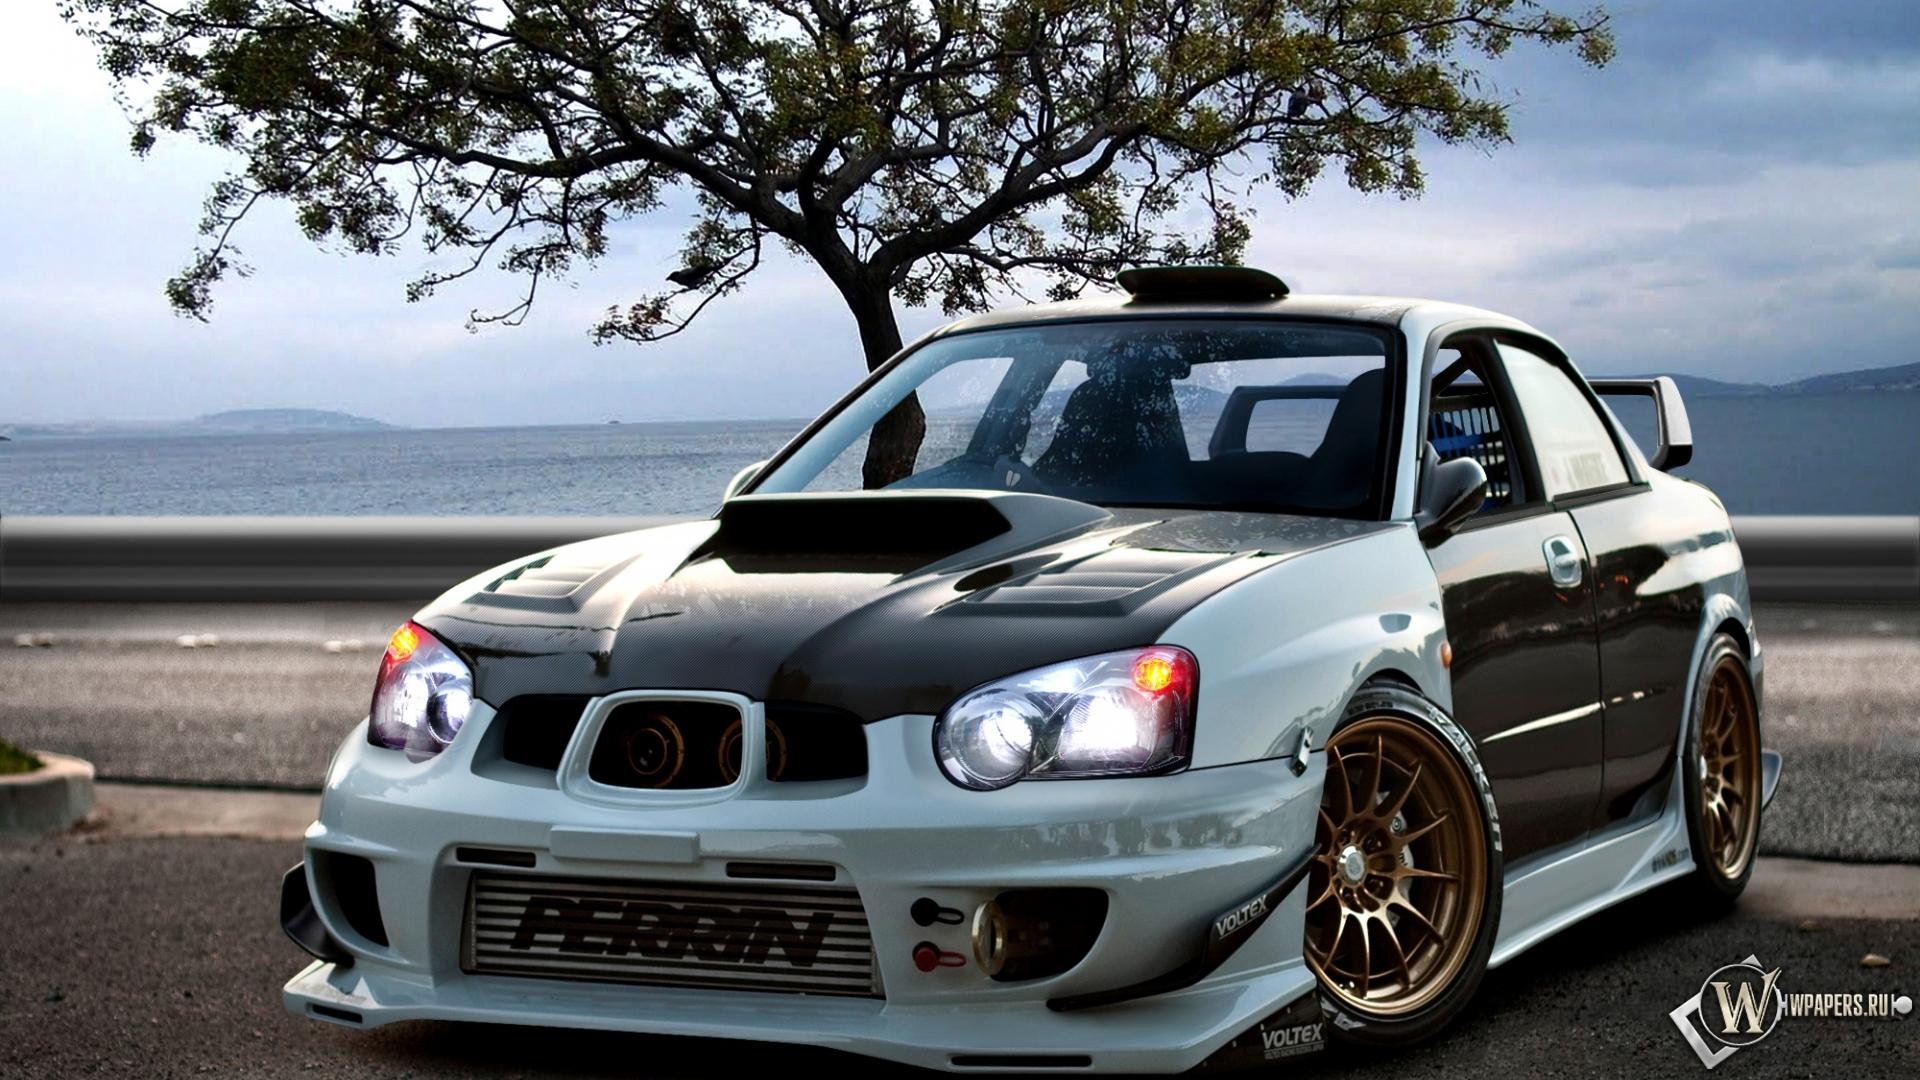 Скачать обои Subaru Impreza WRX STI (Subaru Impreza ...